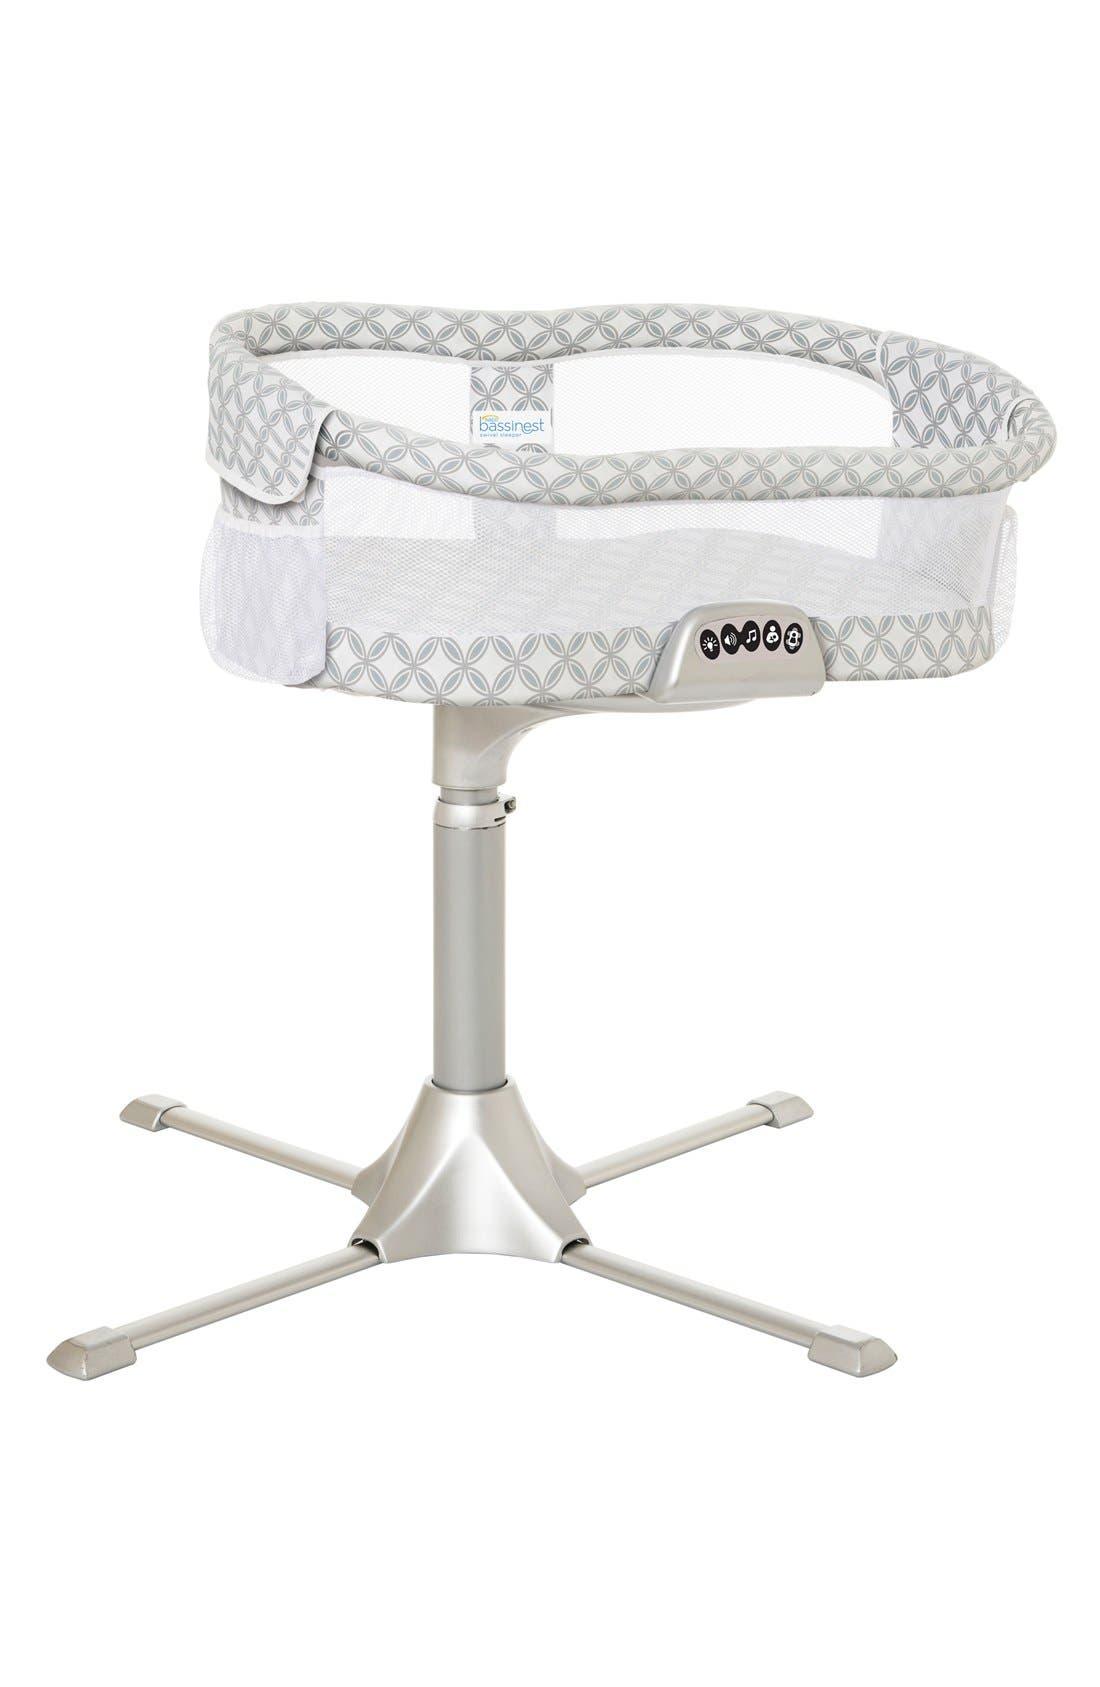 Halo Innovations 'Bassinest' Bedside Swivel Sleeper (Baby)